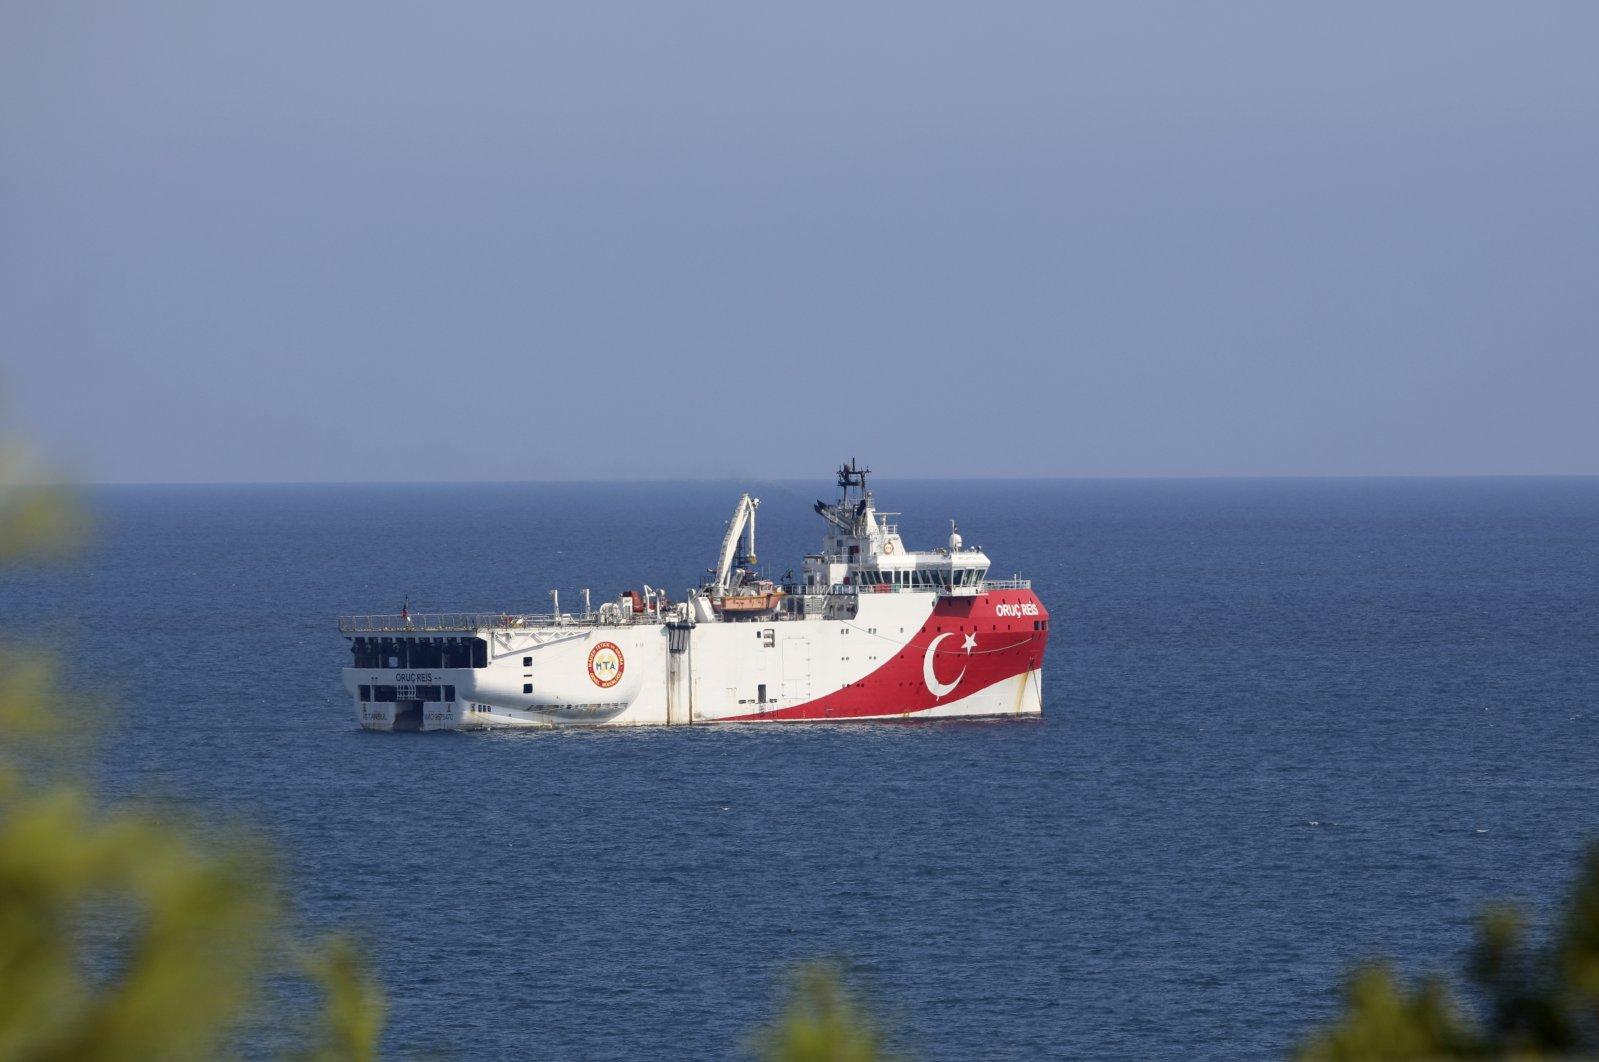 Turkey's research vessel, Oruç Reis, anchored in the Mediterranean Sea off the coast of Antalya, western Turkey, Sept. 13, 2020. (AP Photo)